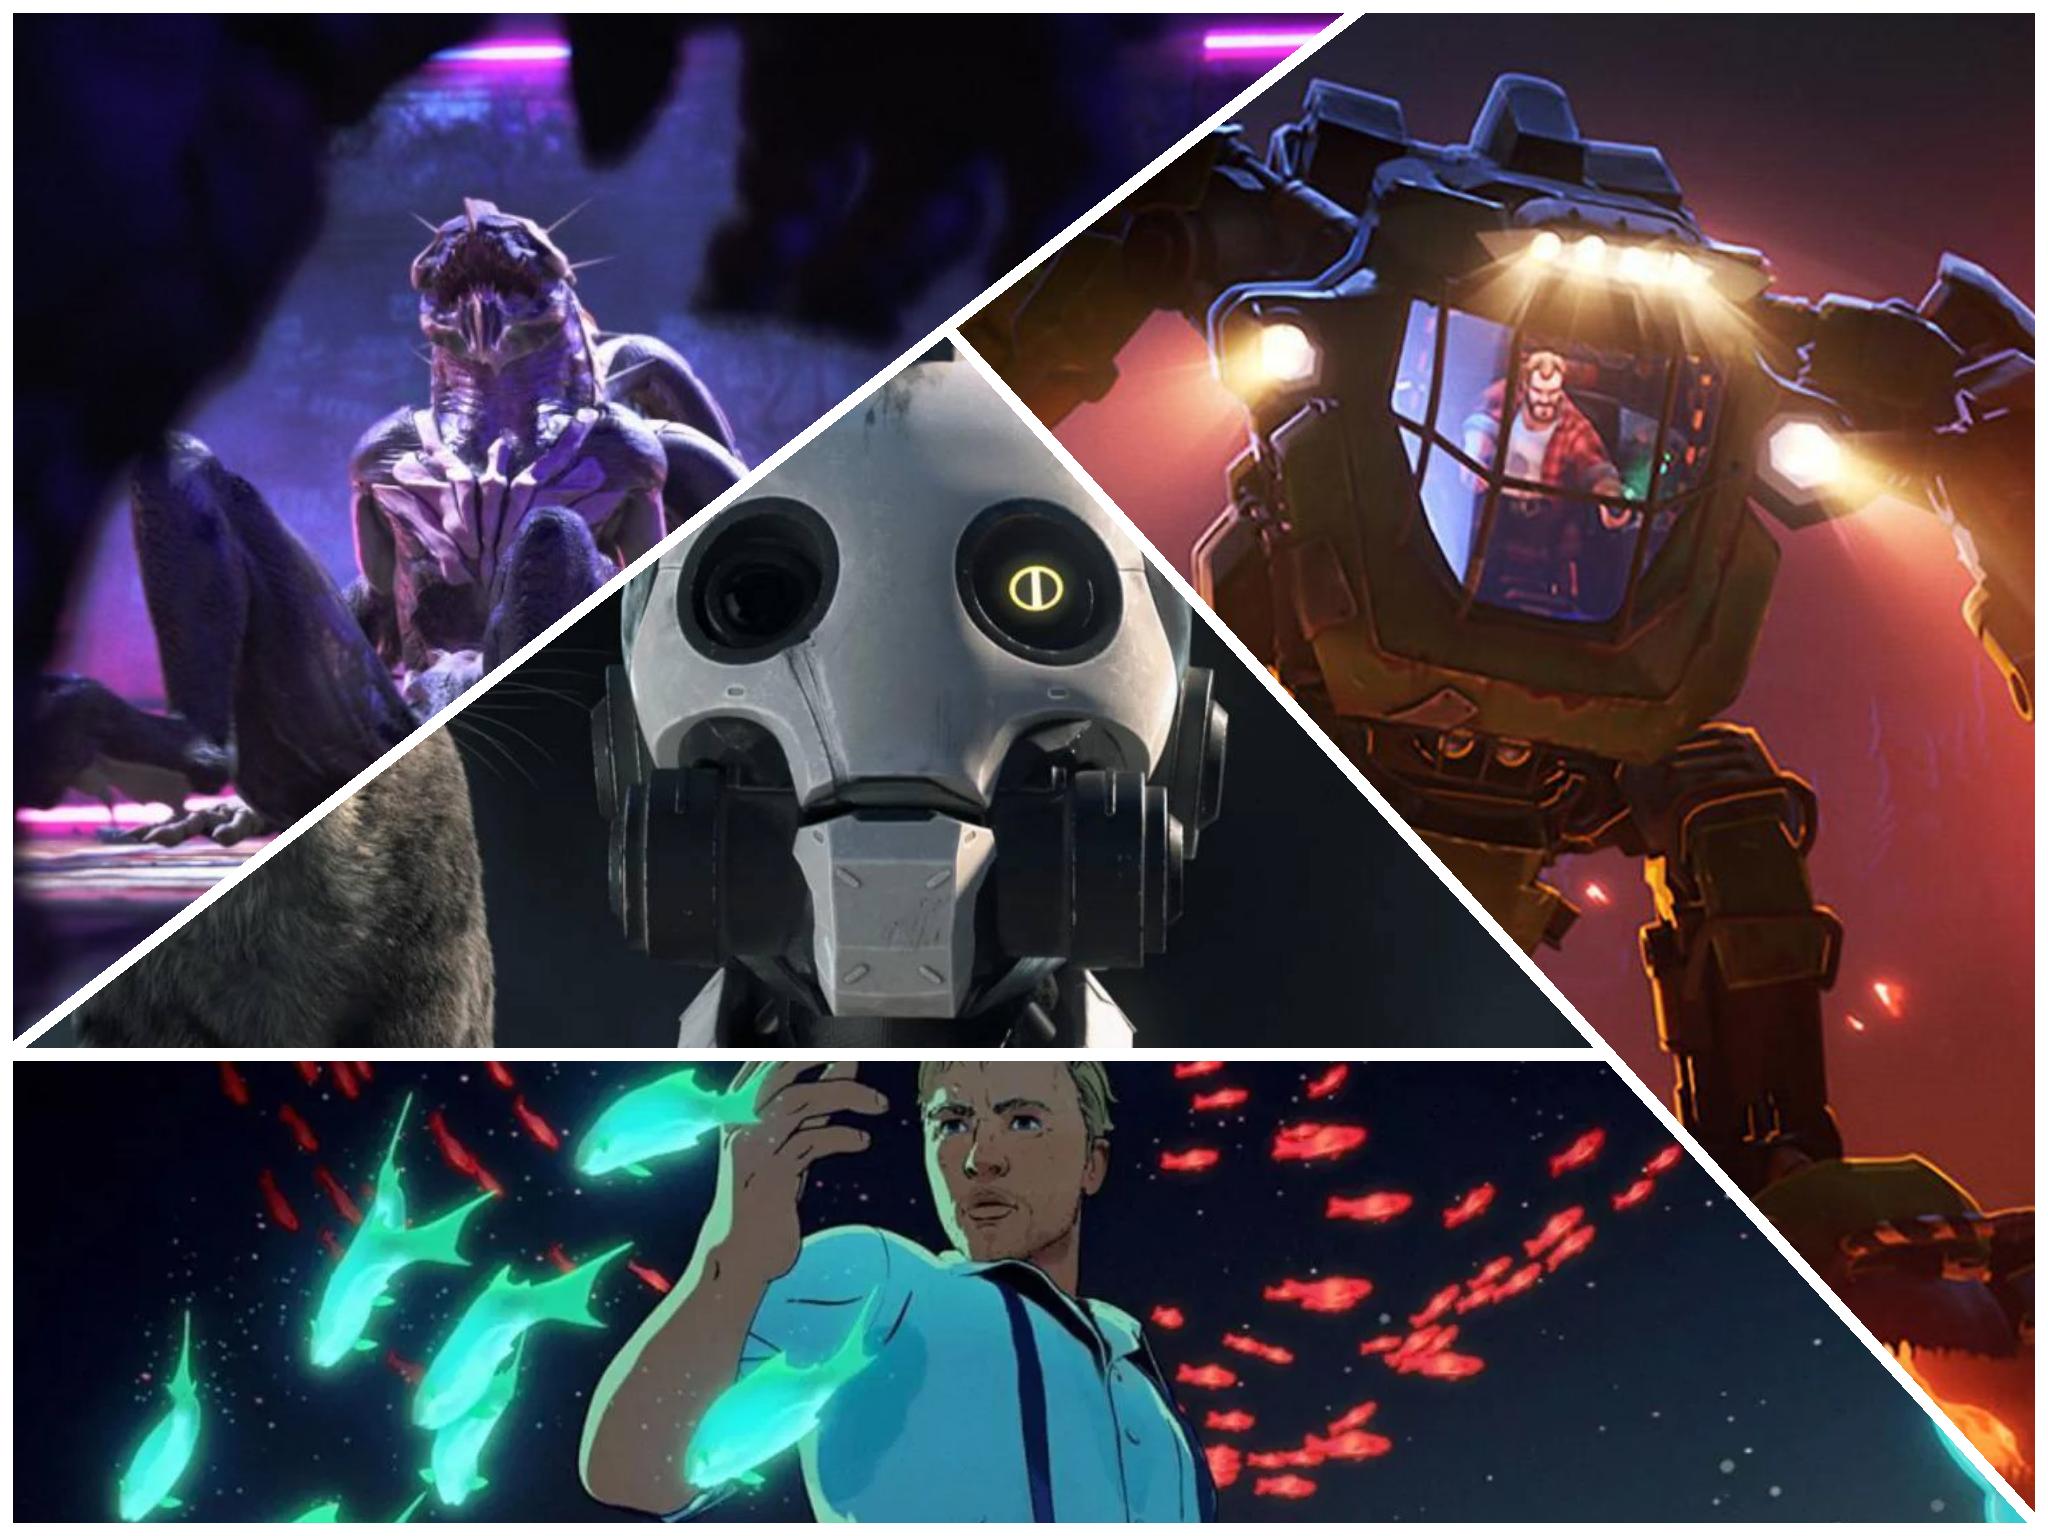 netlfix-lo-dijo-love-death-and-robots-tendra-segunda-temporada